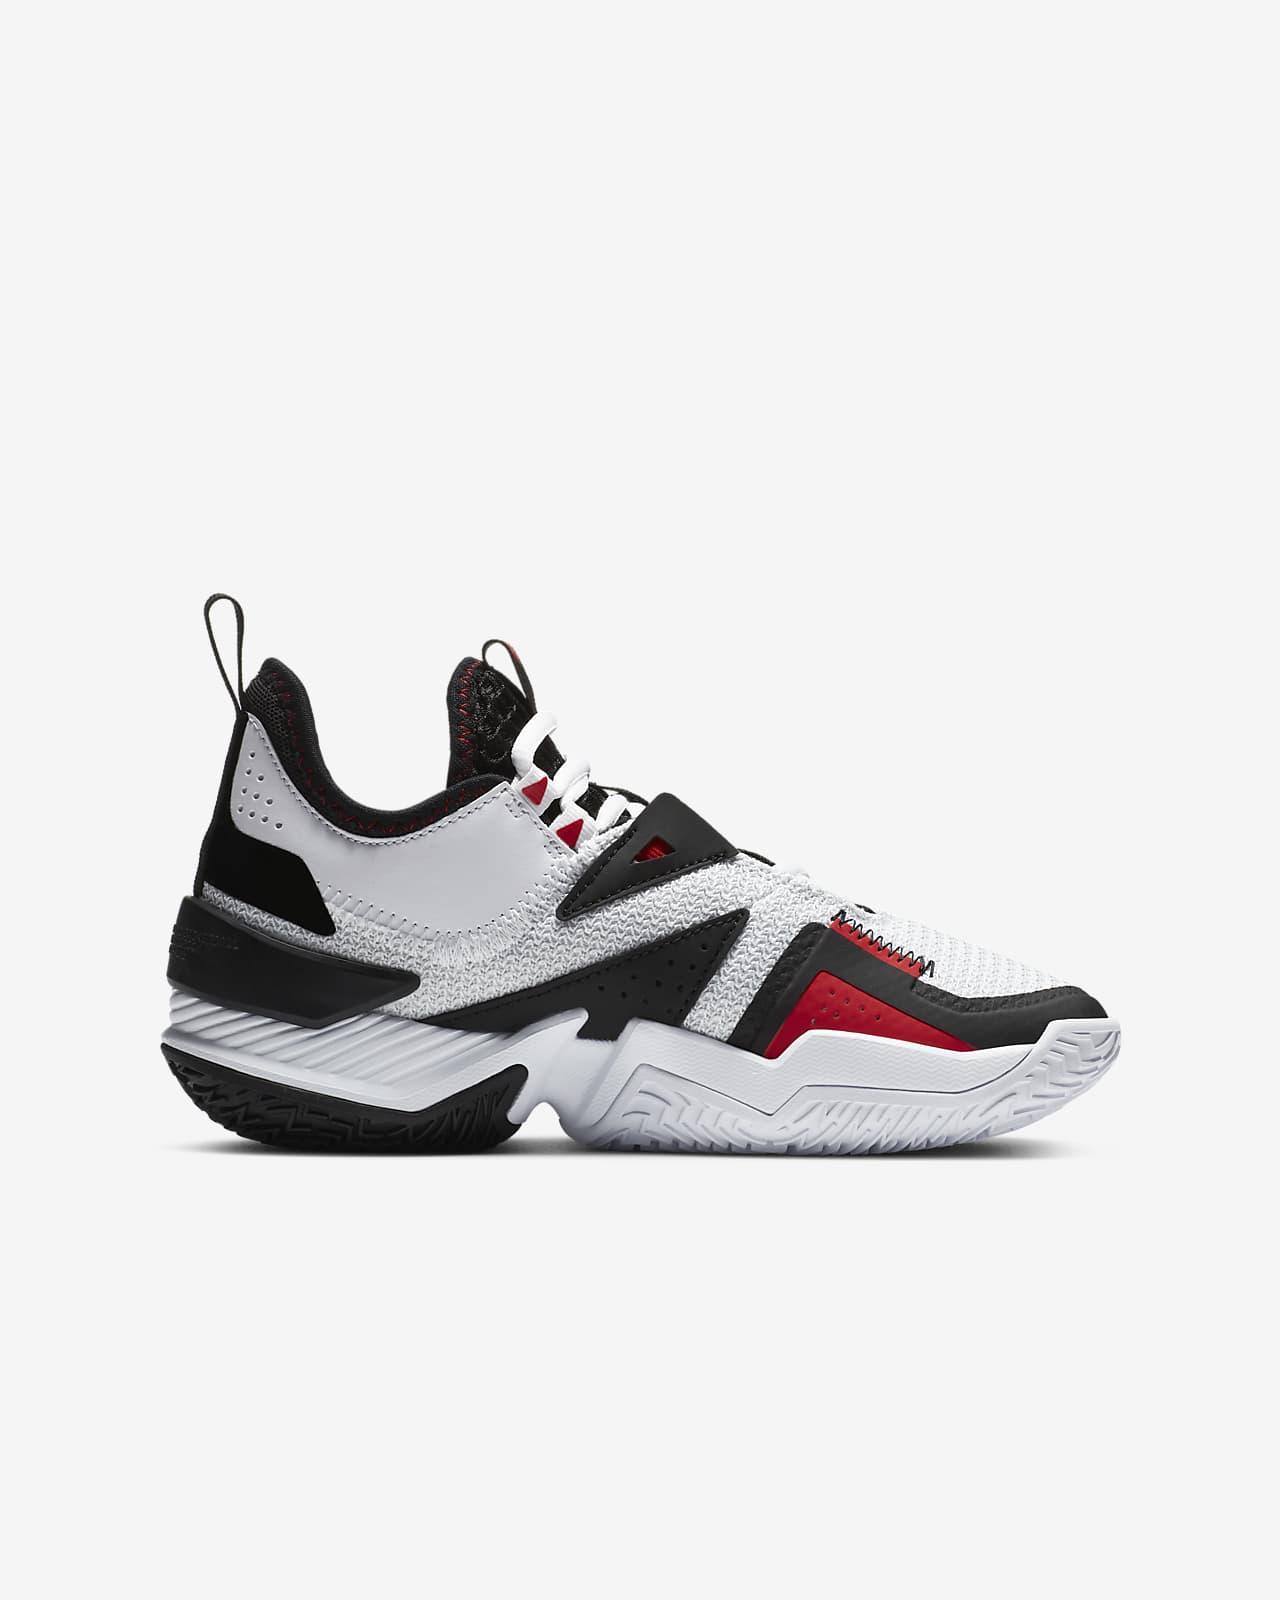 nike basketball shoes jordan series